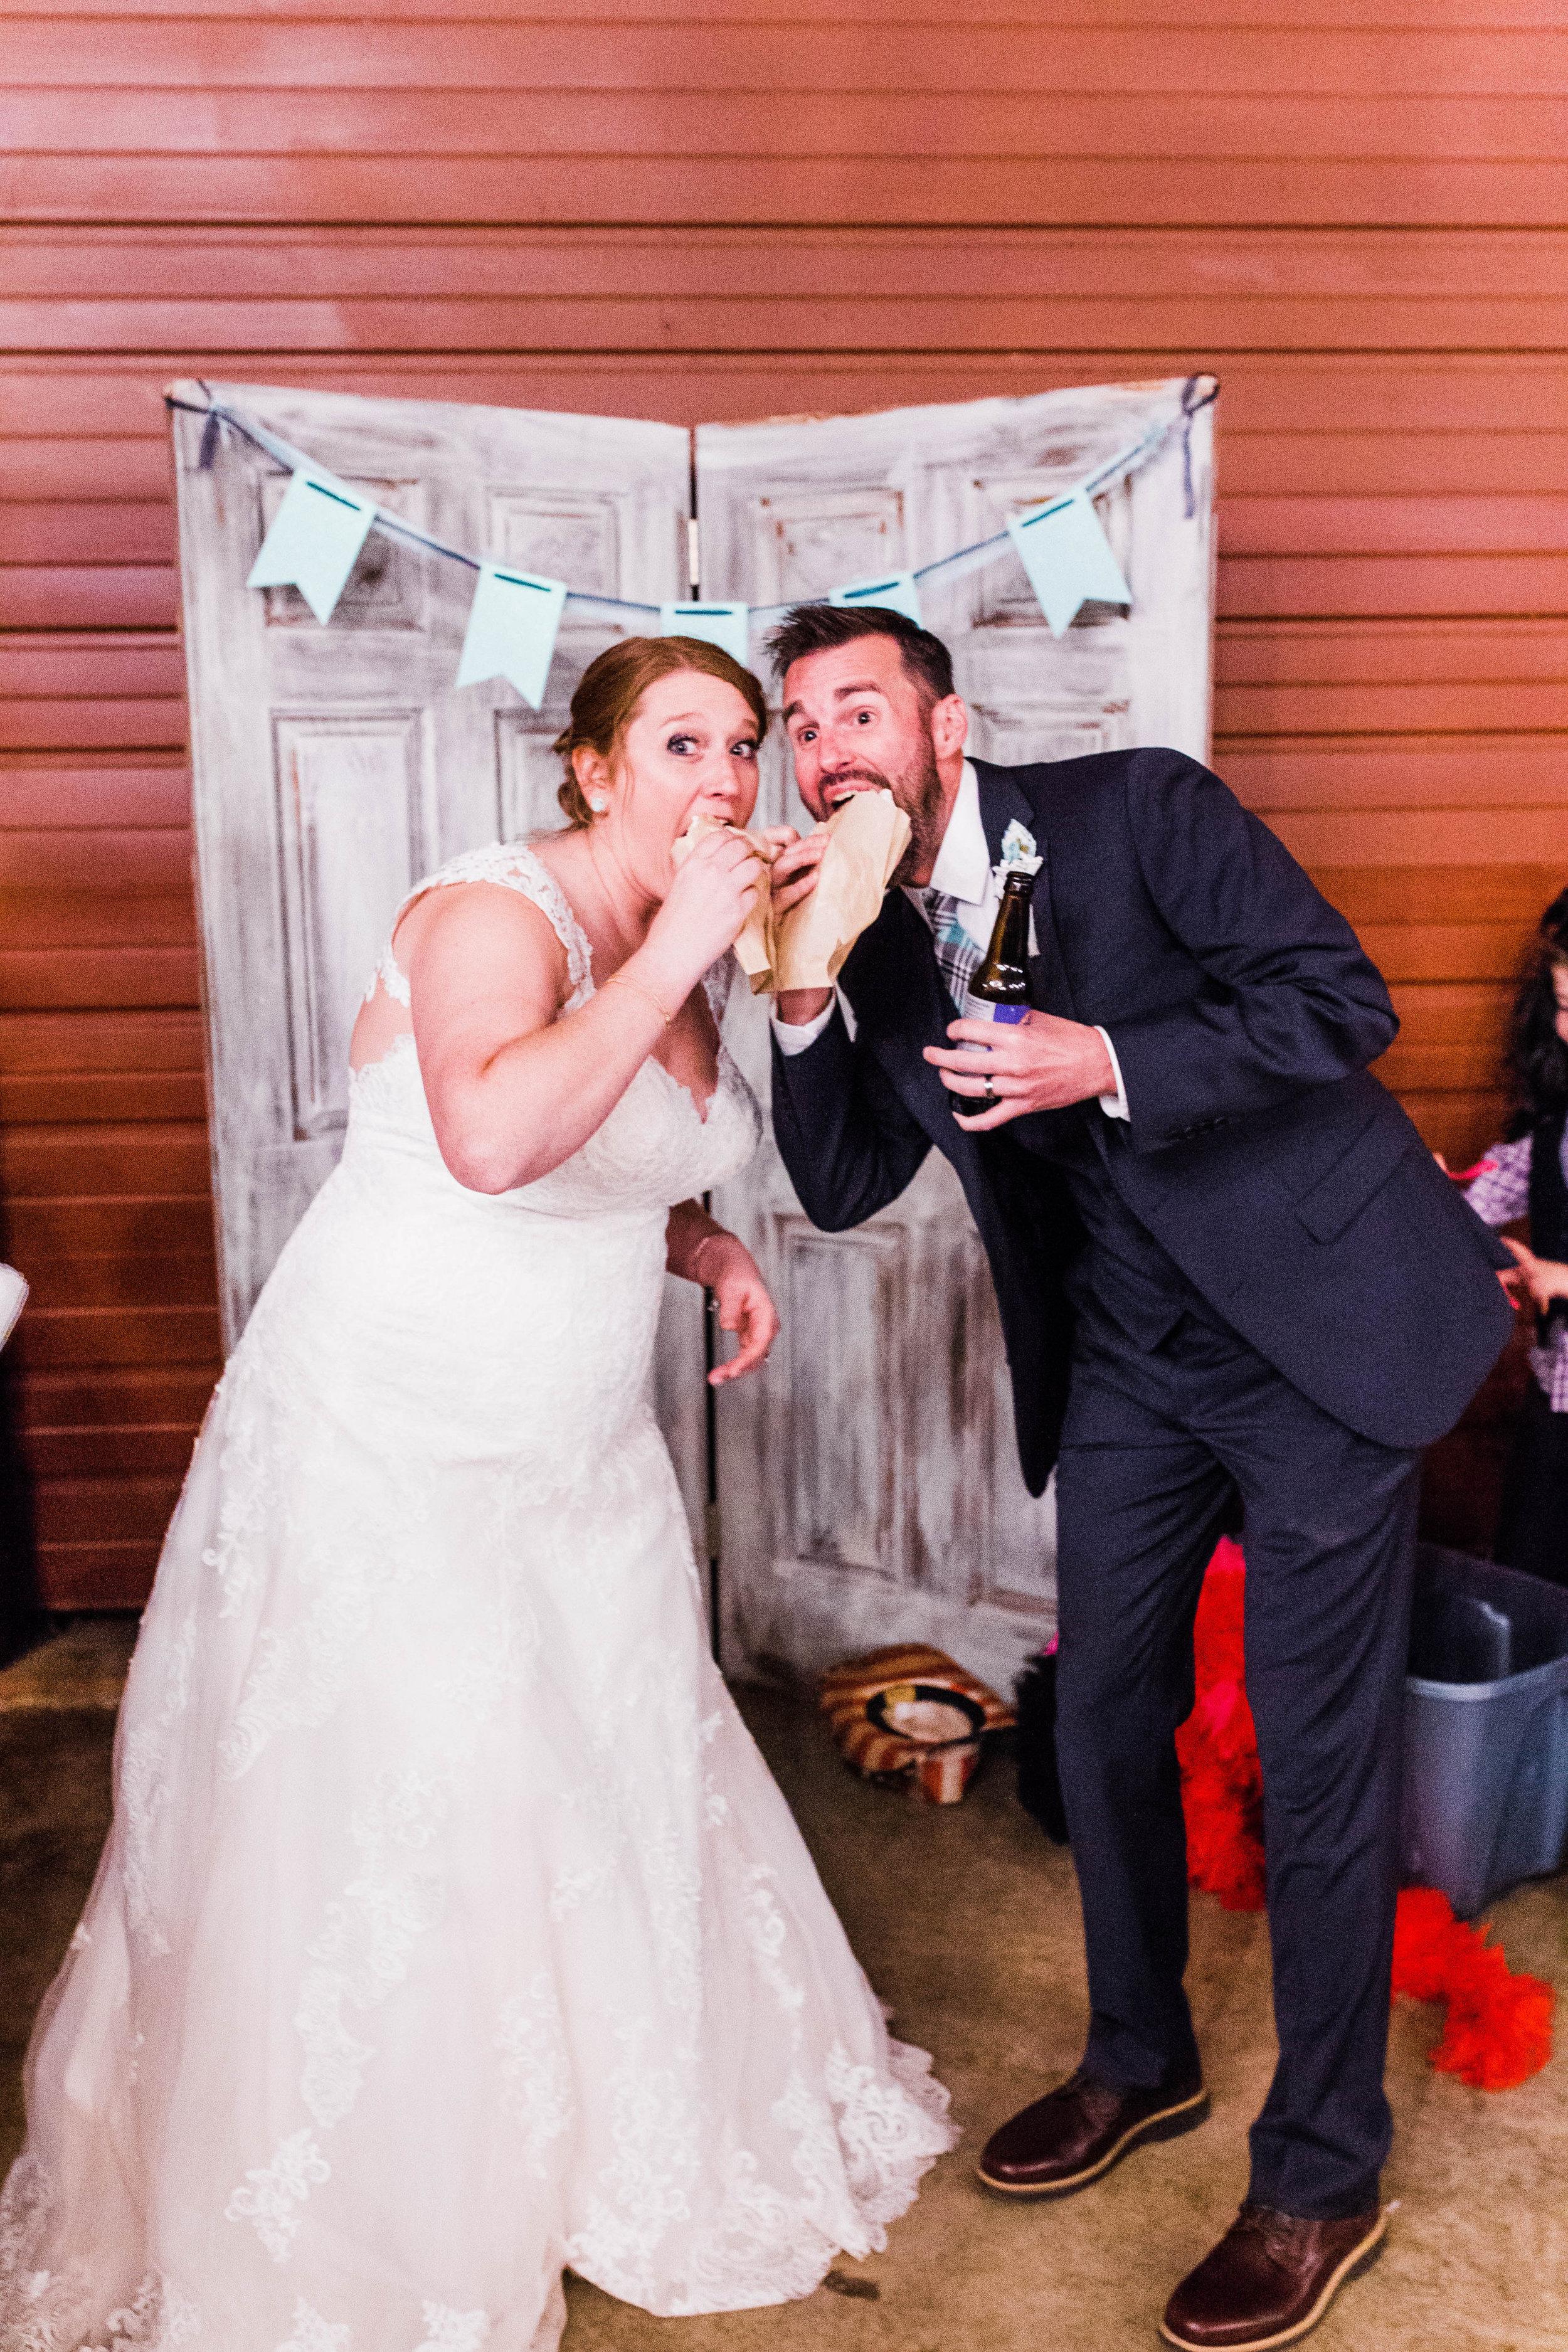 Honeysuckle-Hill-Weddings-Andrew-Rachel-291.jpg